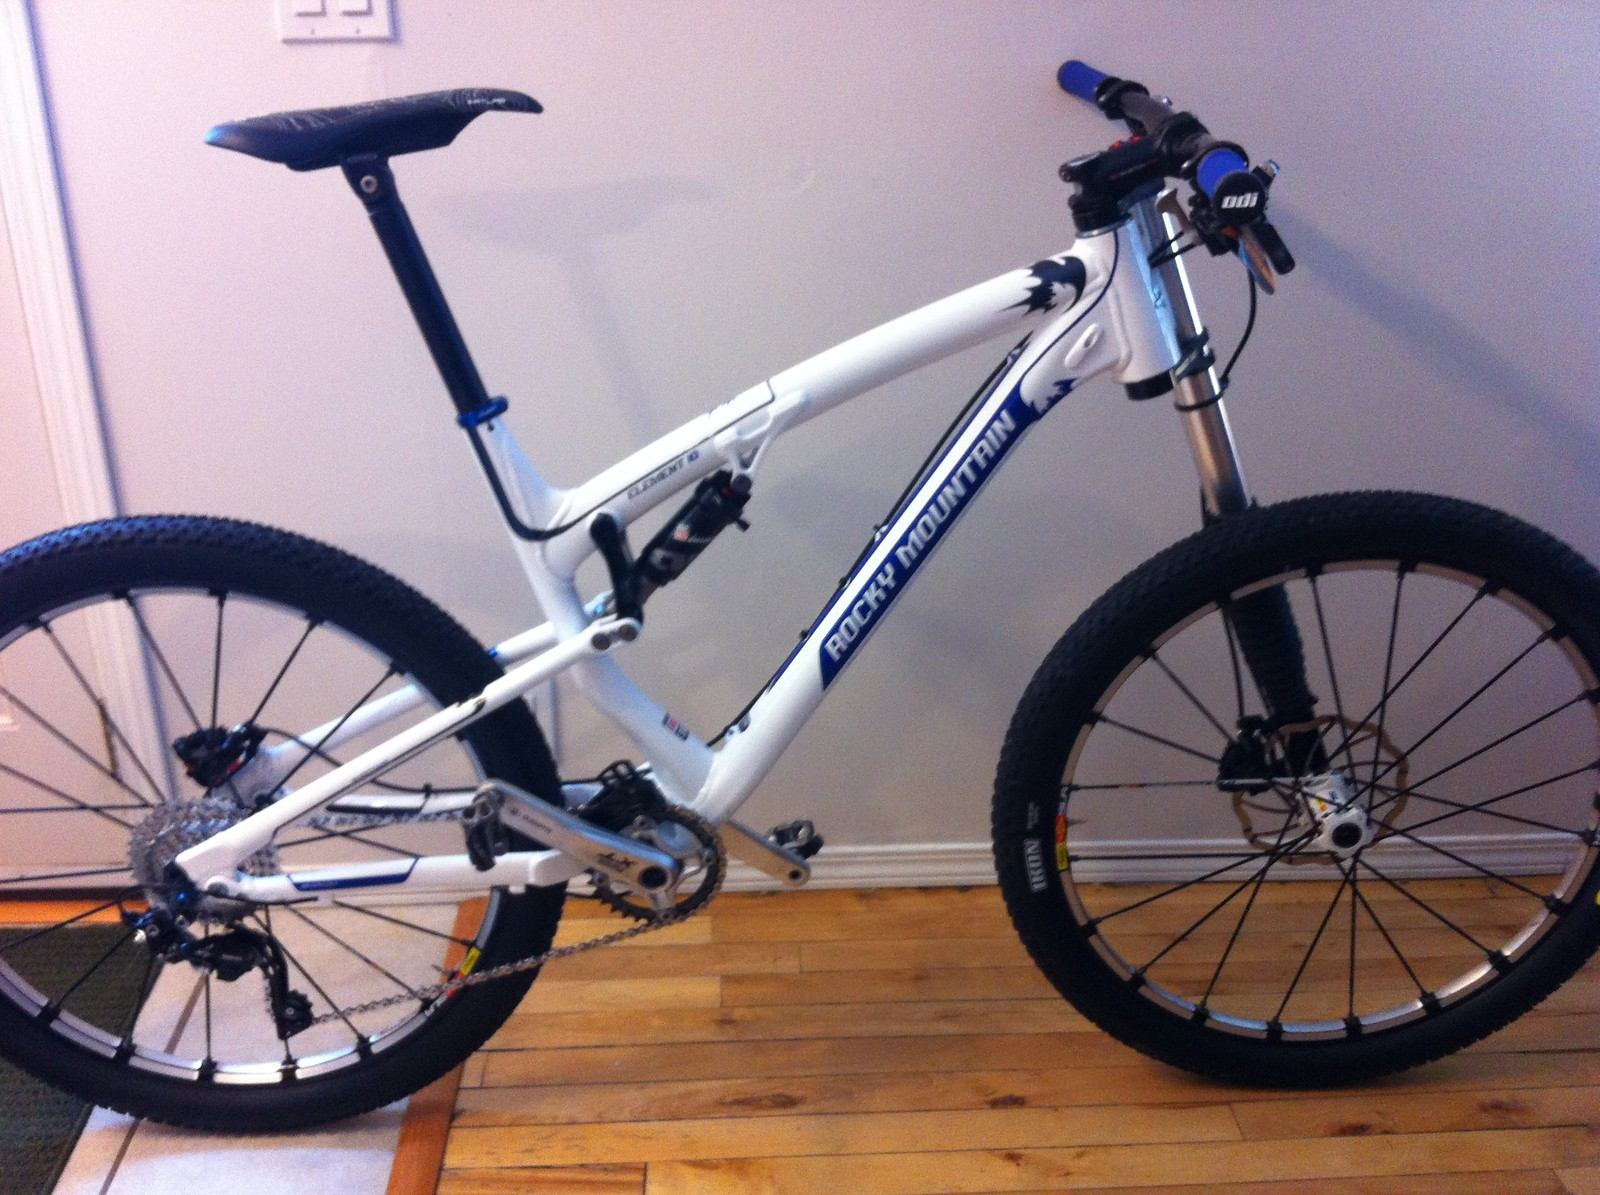 photo - Brix326 - Mountain Biking Pictures - Vital MTB